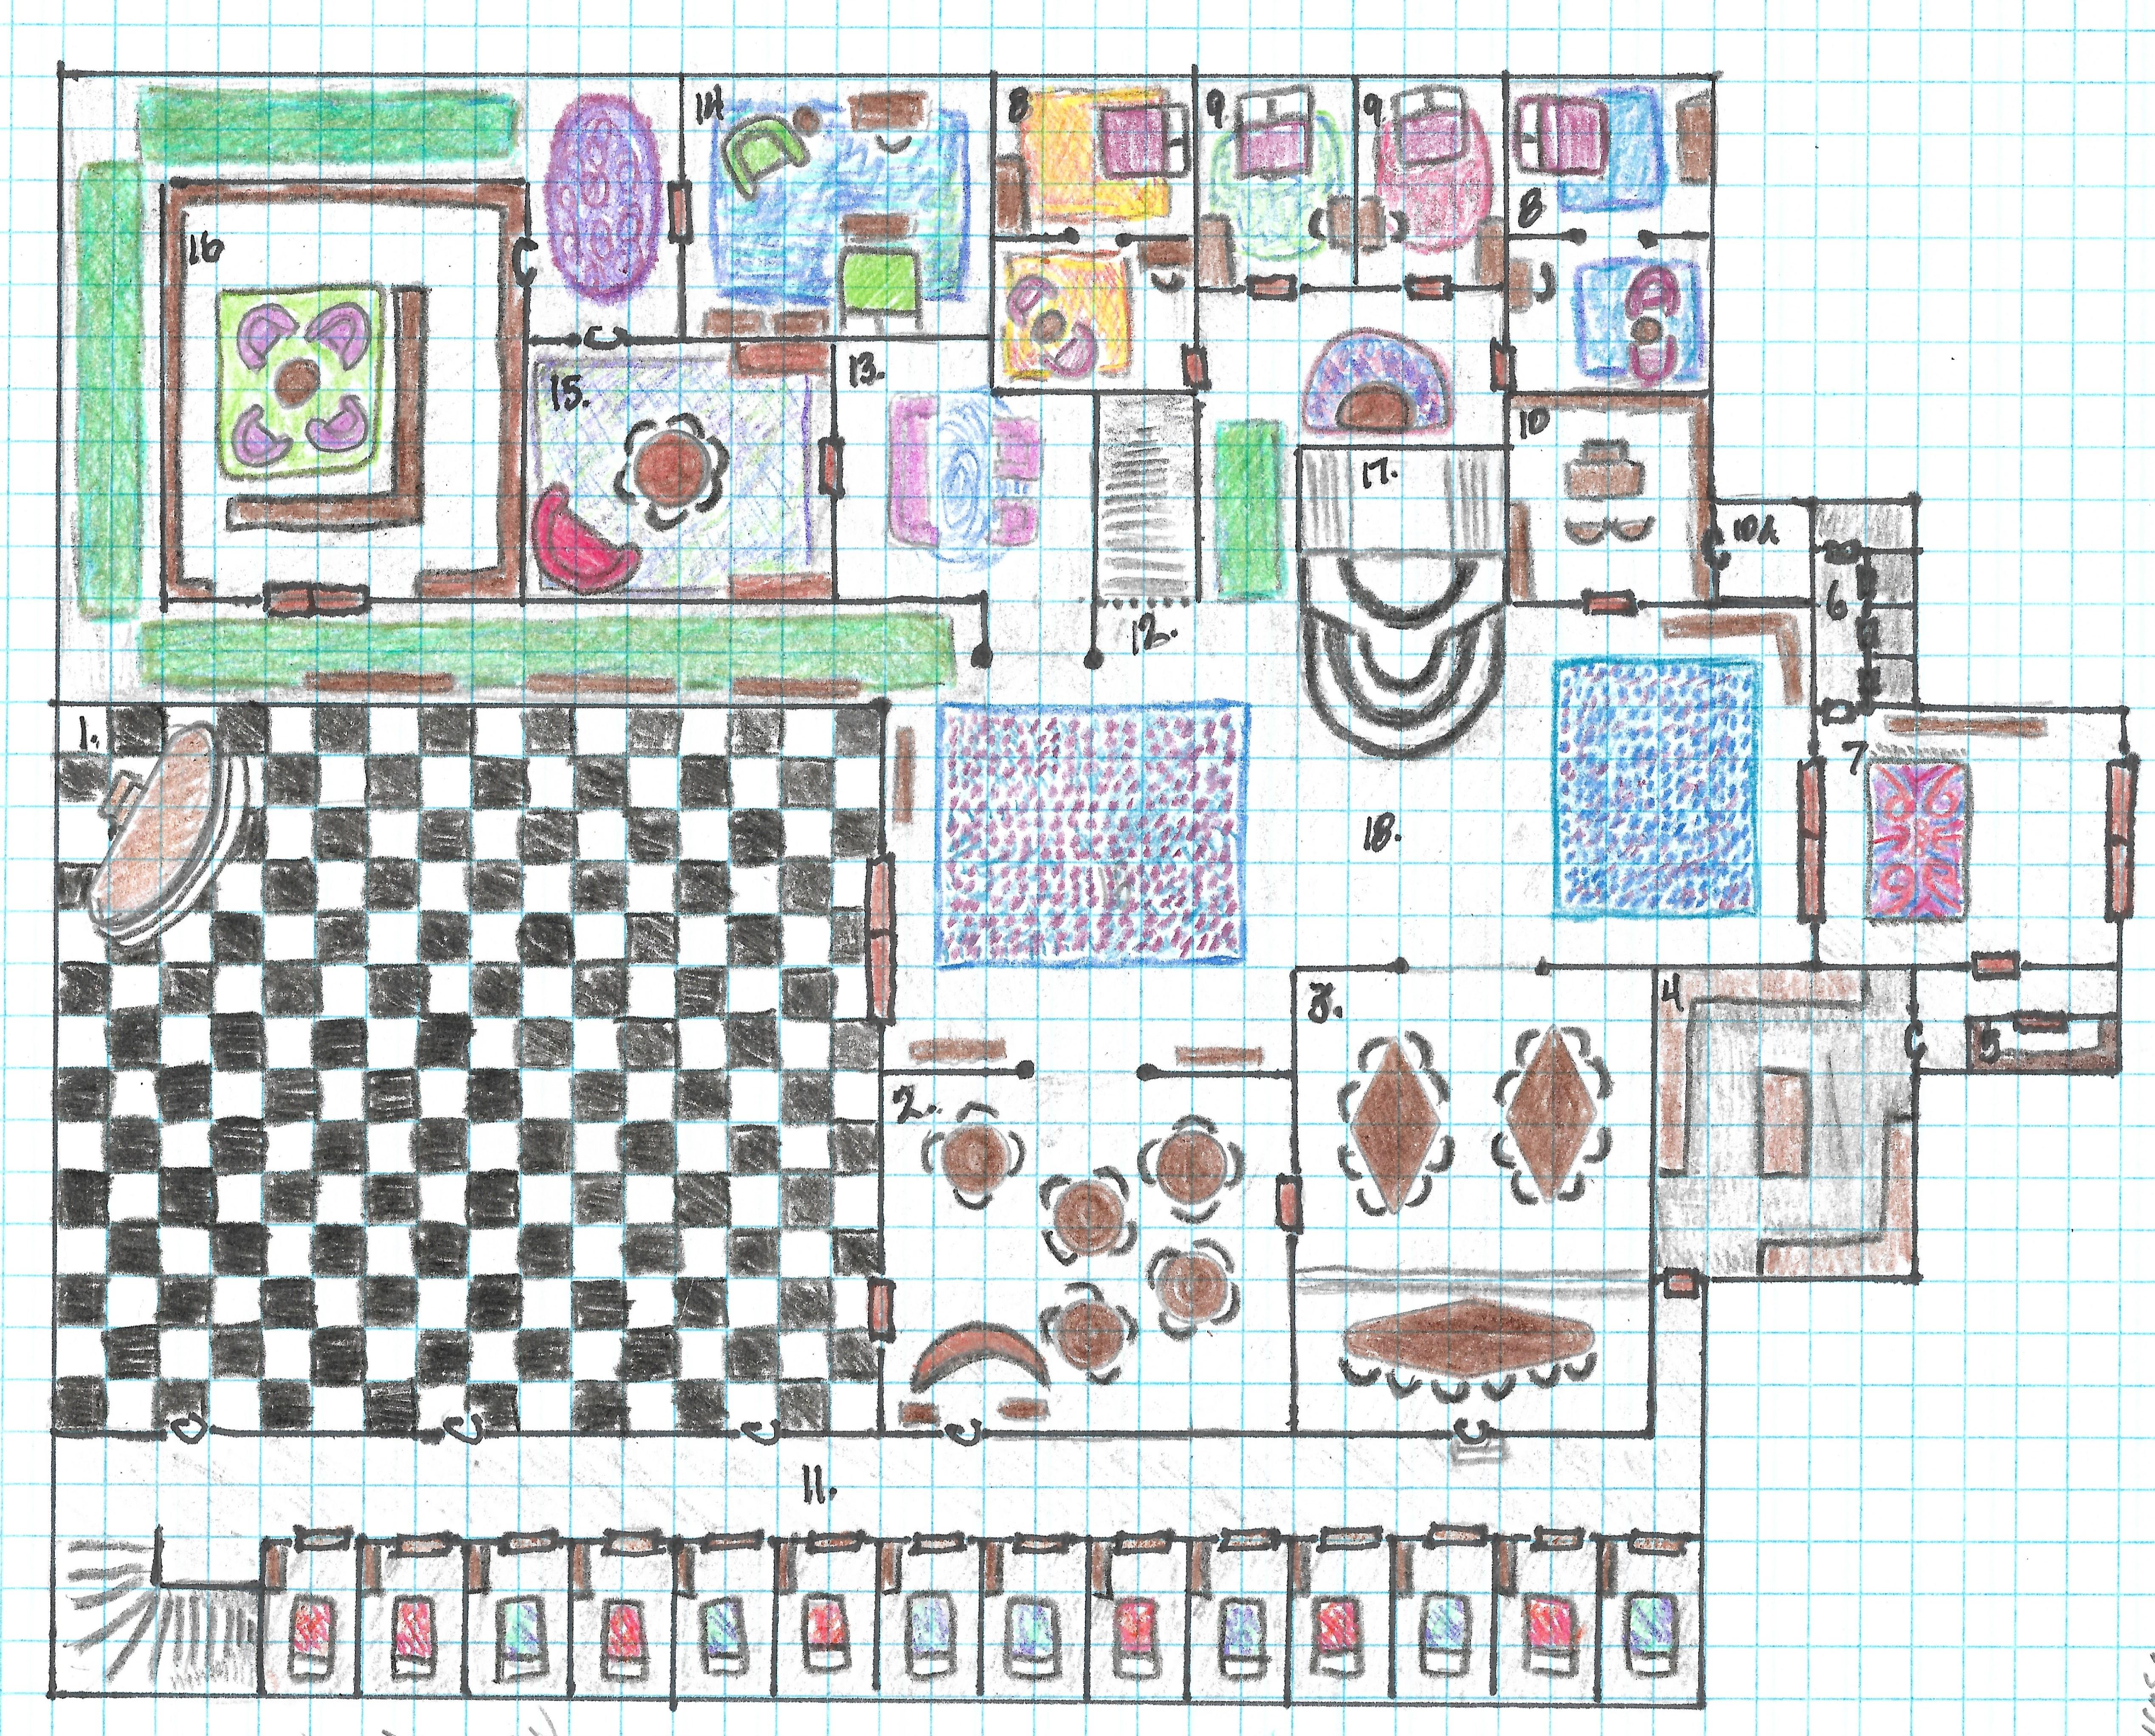 Stray_Manor_Main_floor.jpg